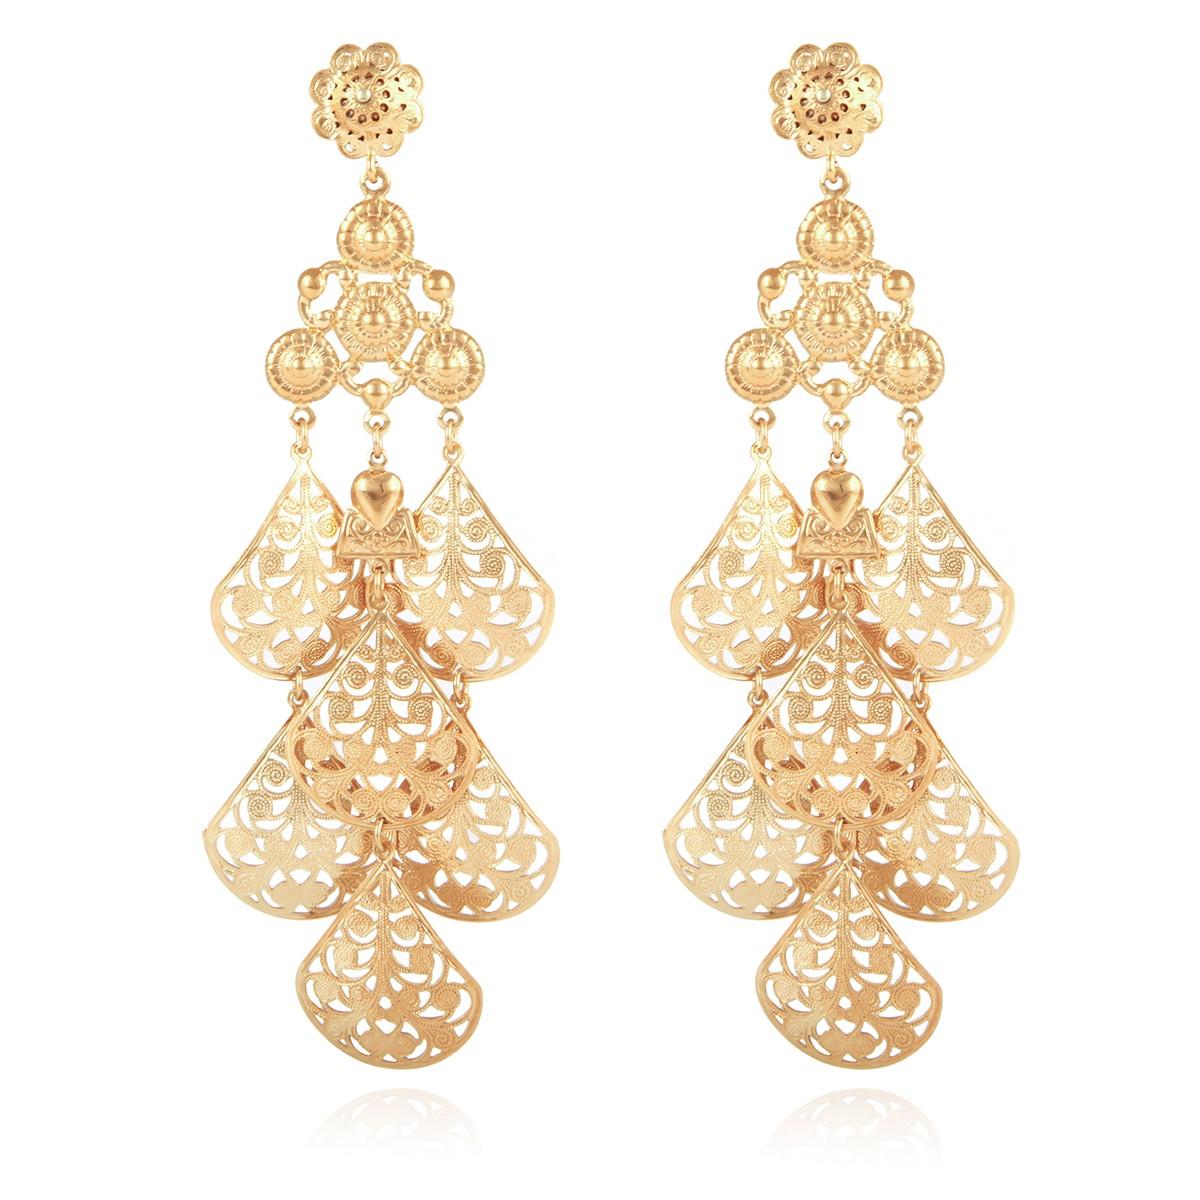 boucles-oreilles-orferia-gm-or-gas-bijoux-000_1.jpg